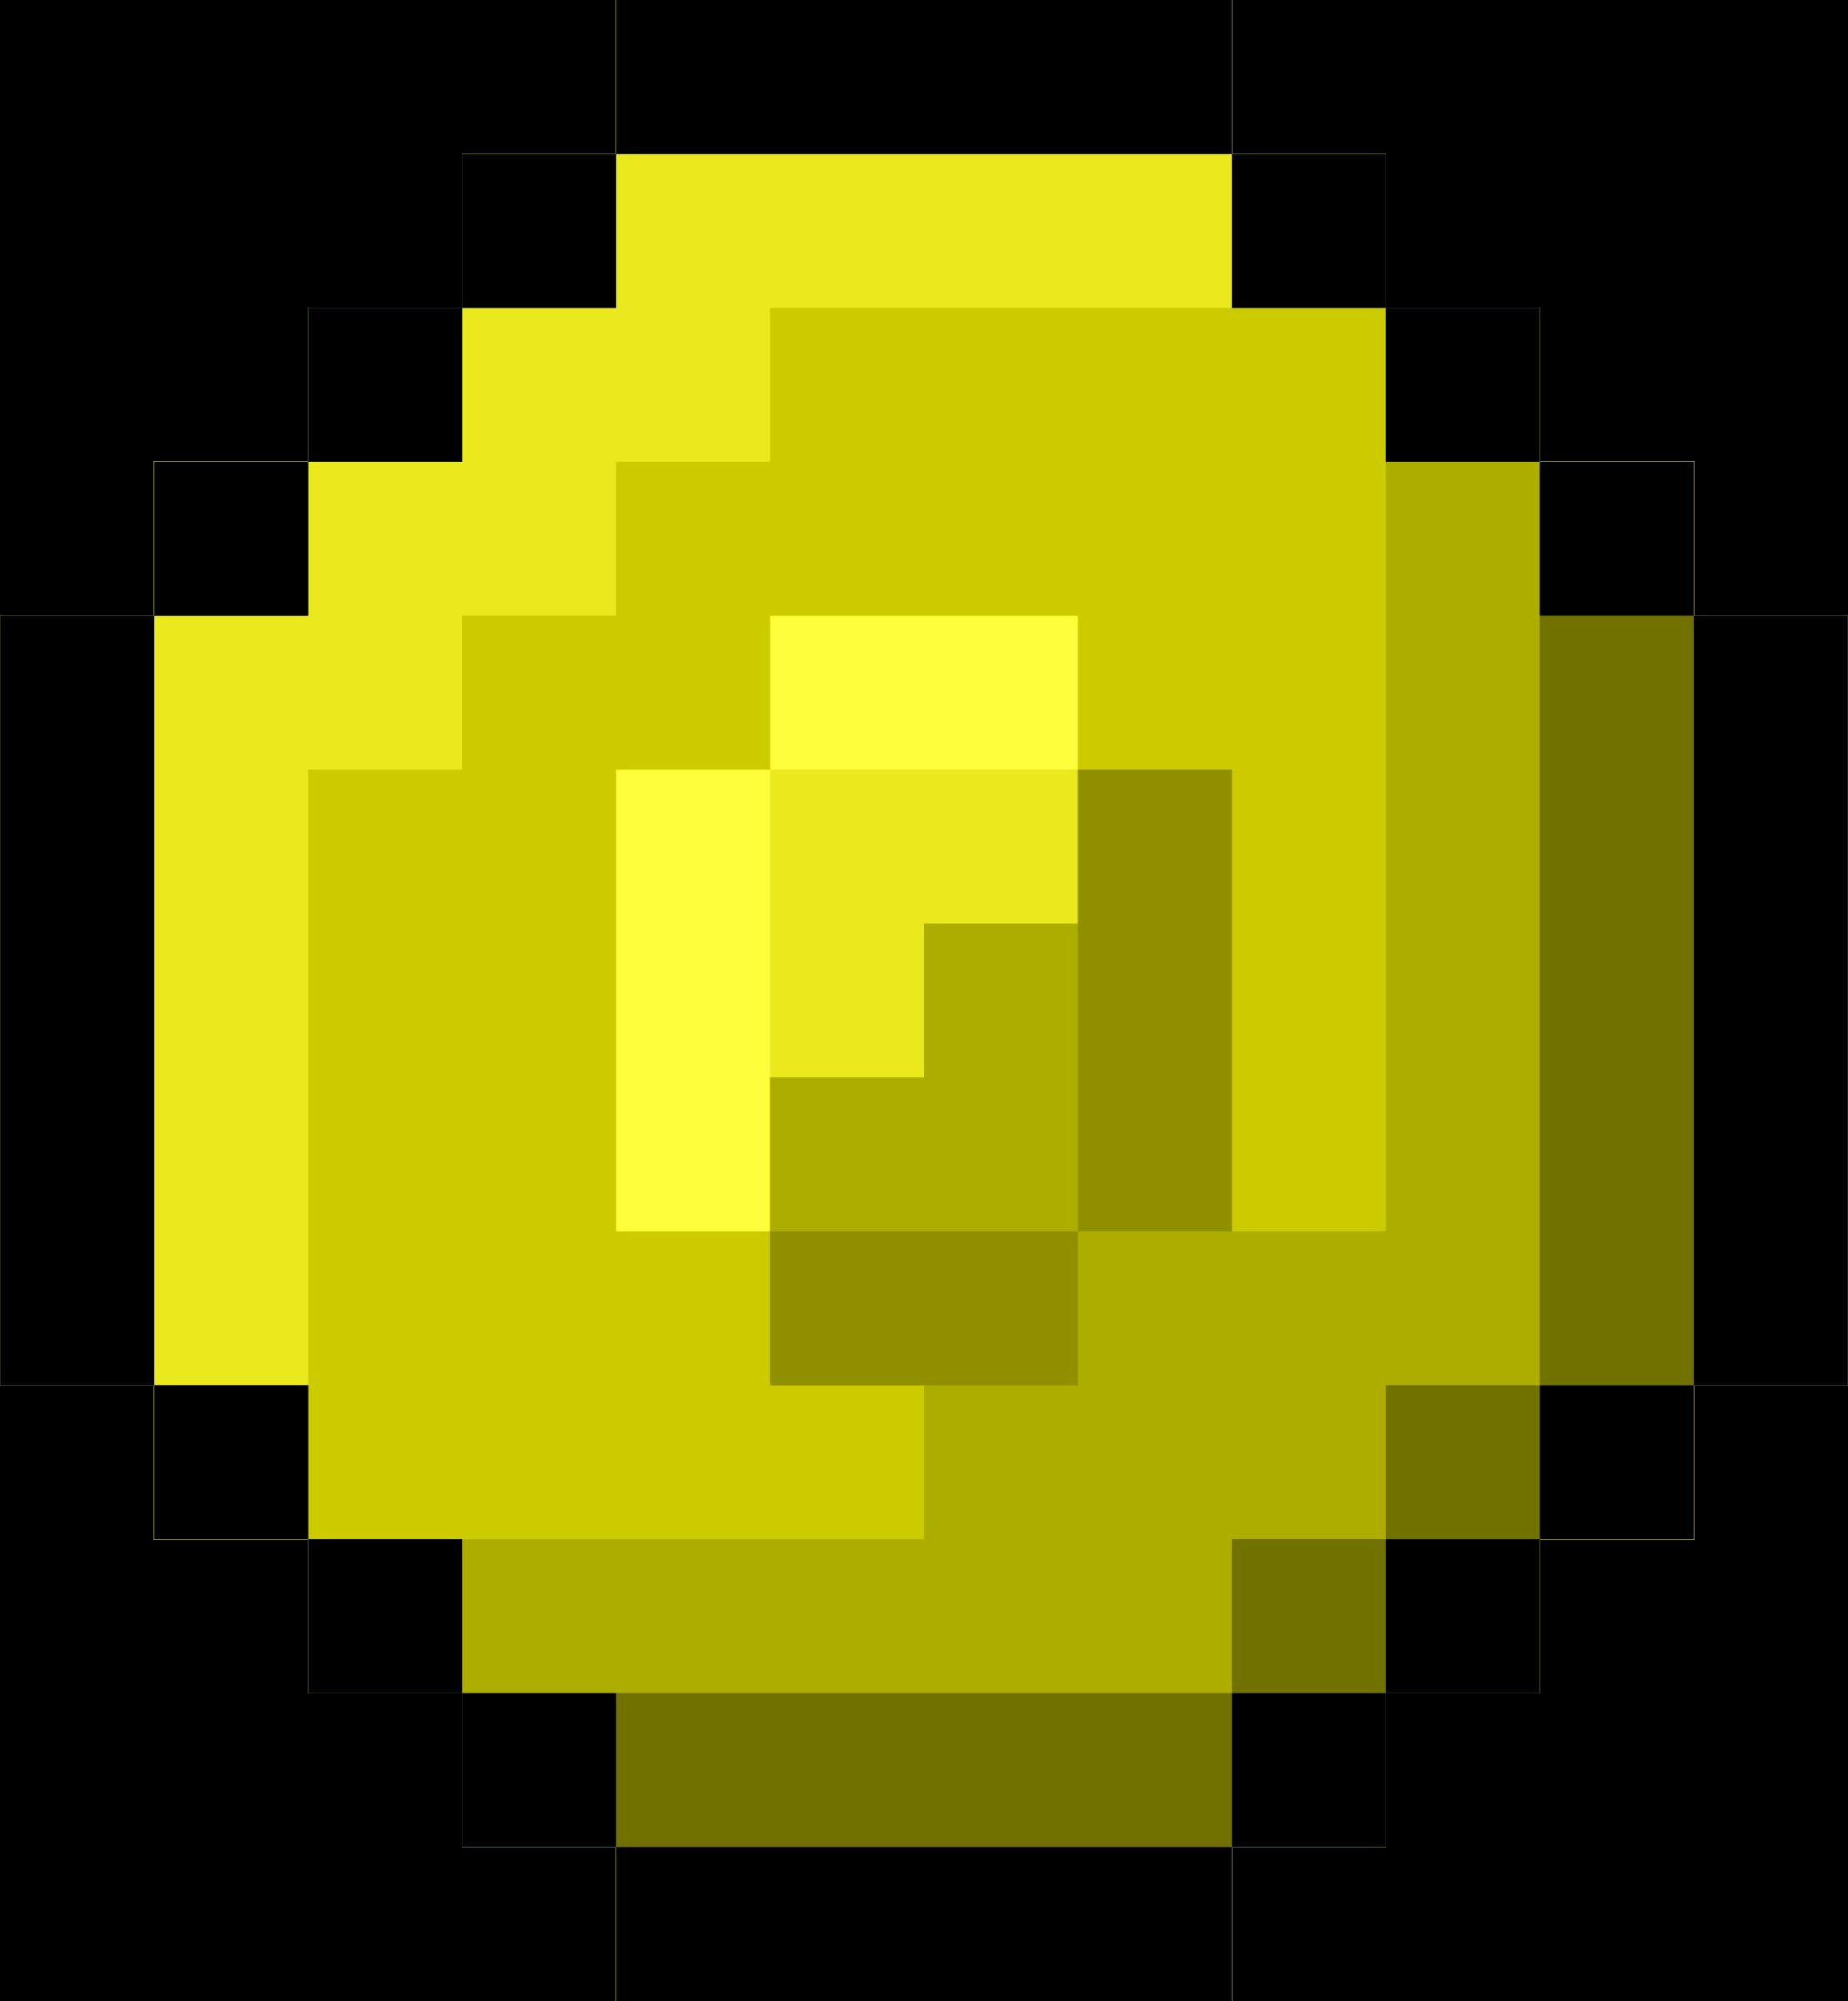 Pixel clipart Pixel Gold Coin Coin Pixel